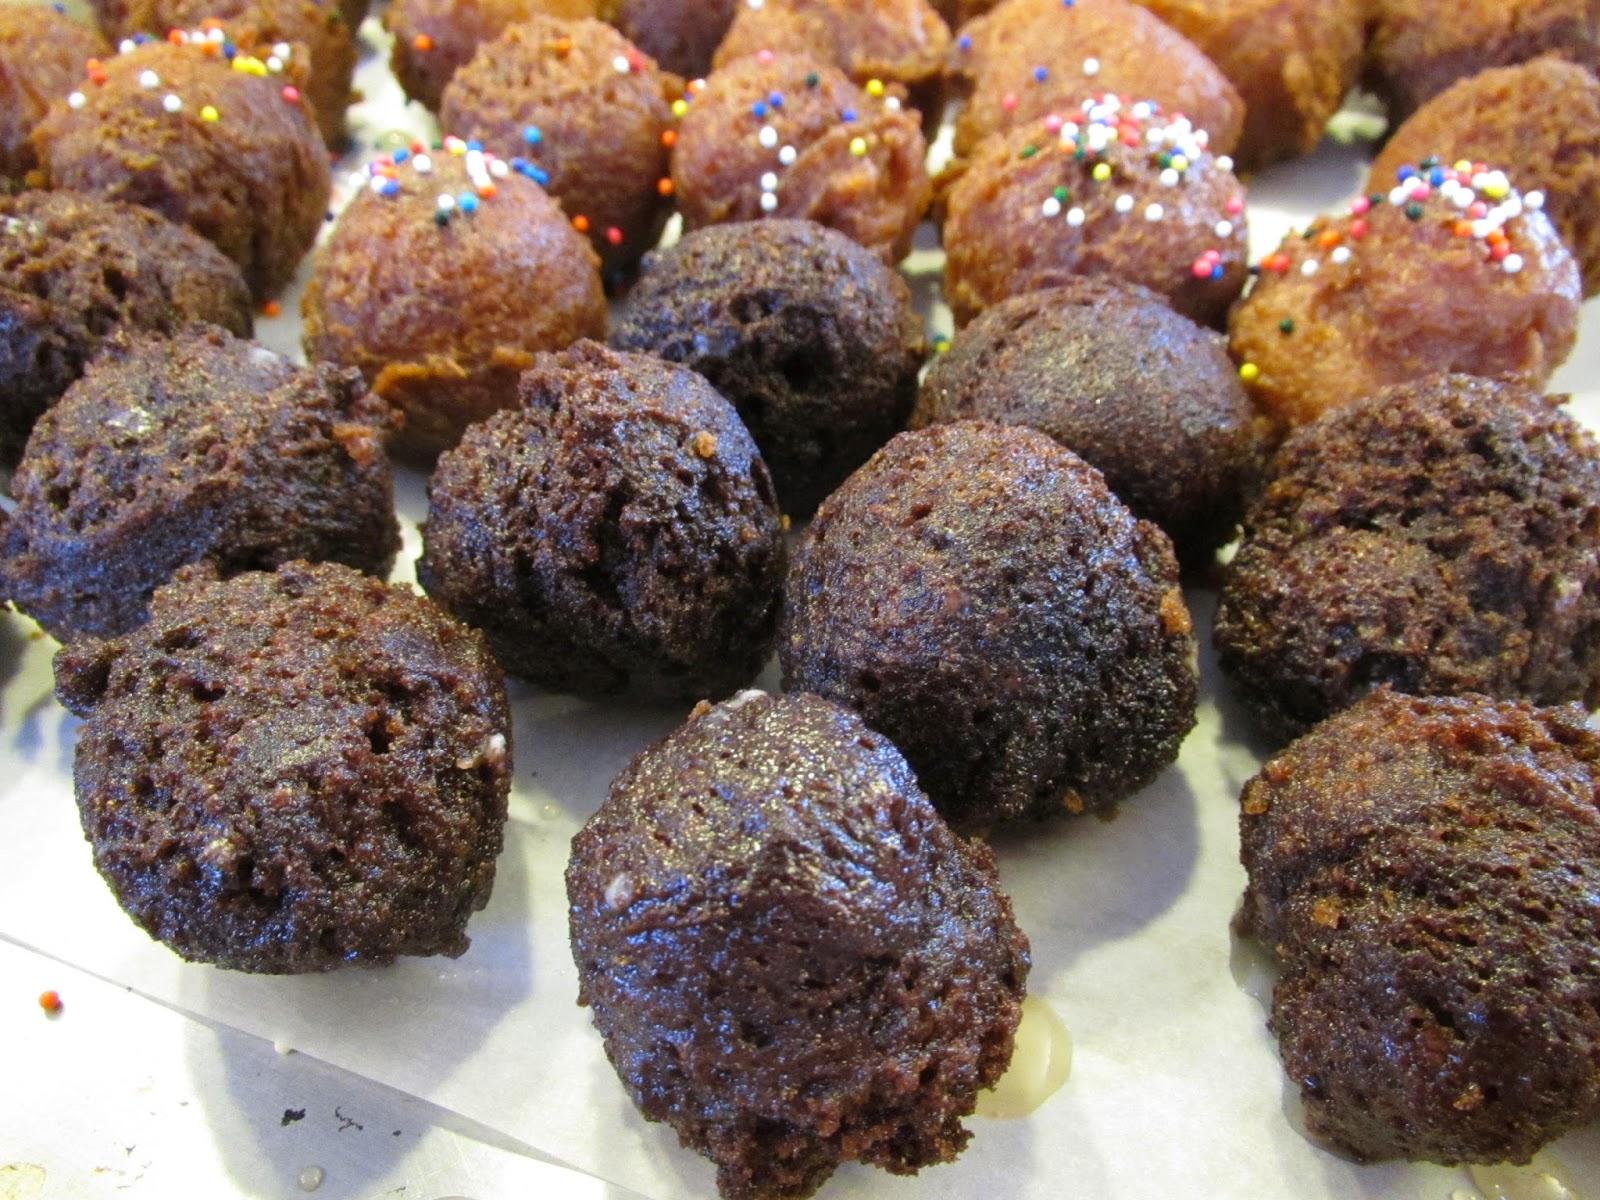 Gluten Free Glazed Chocolate Donut Holes